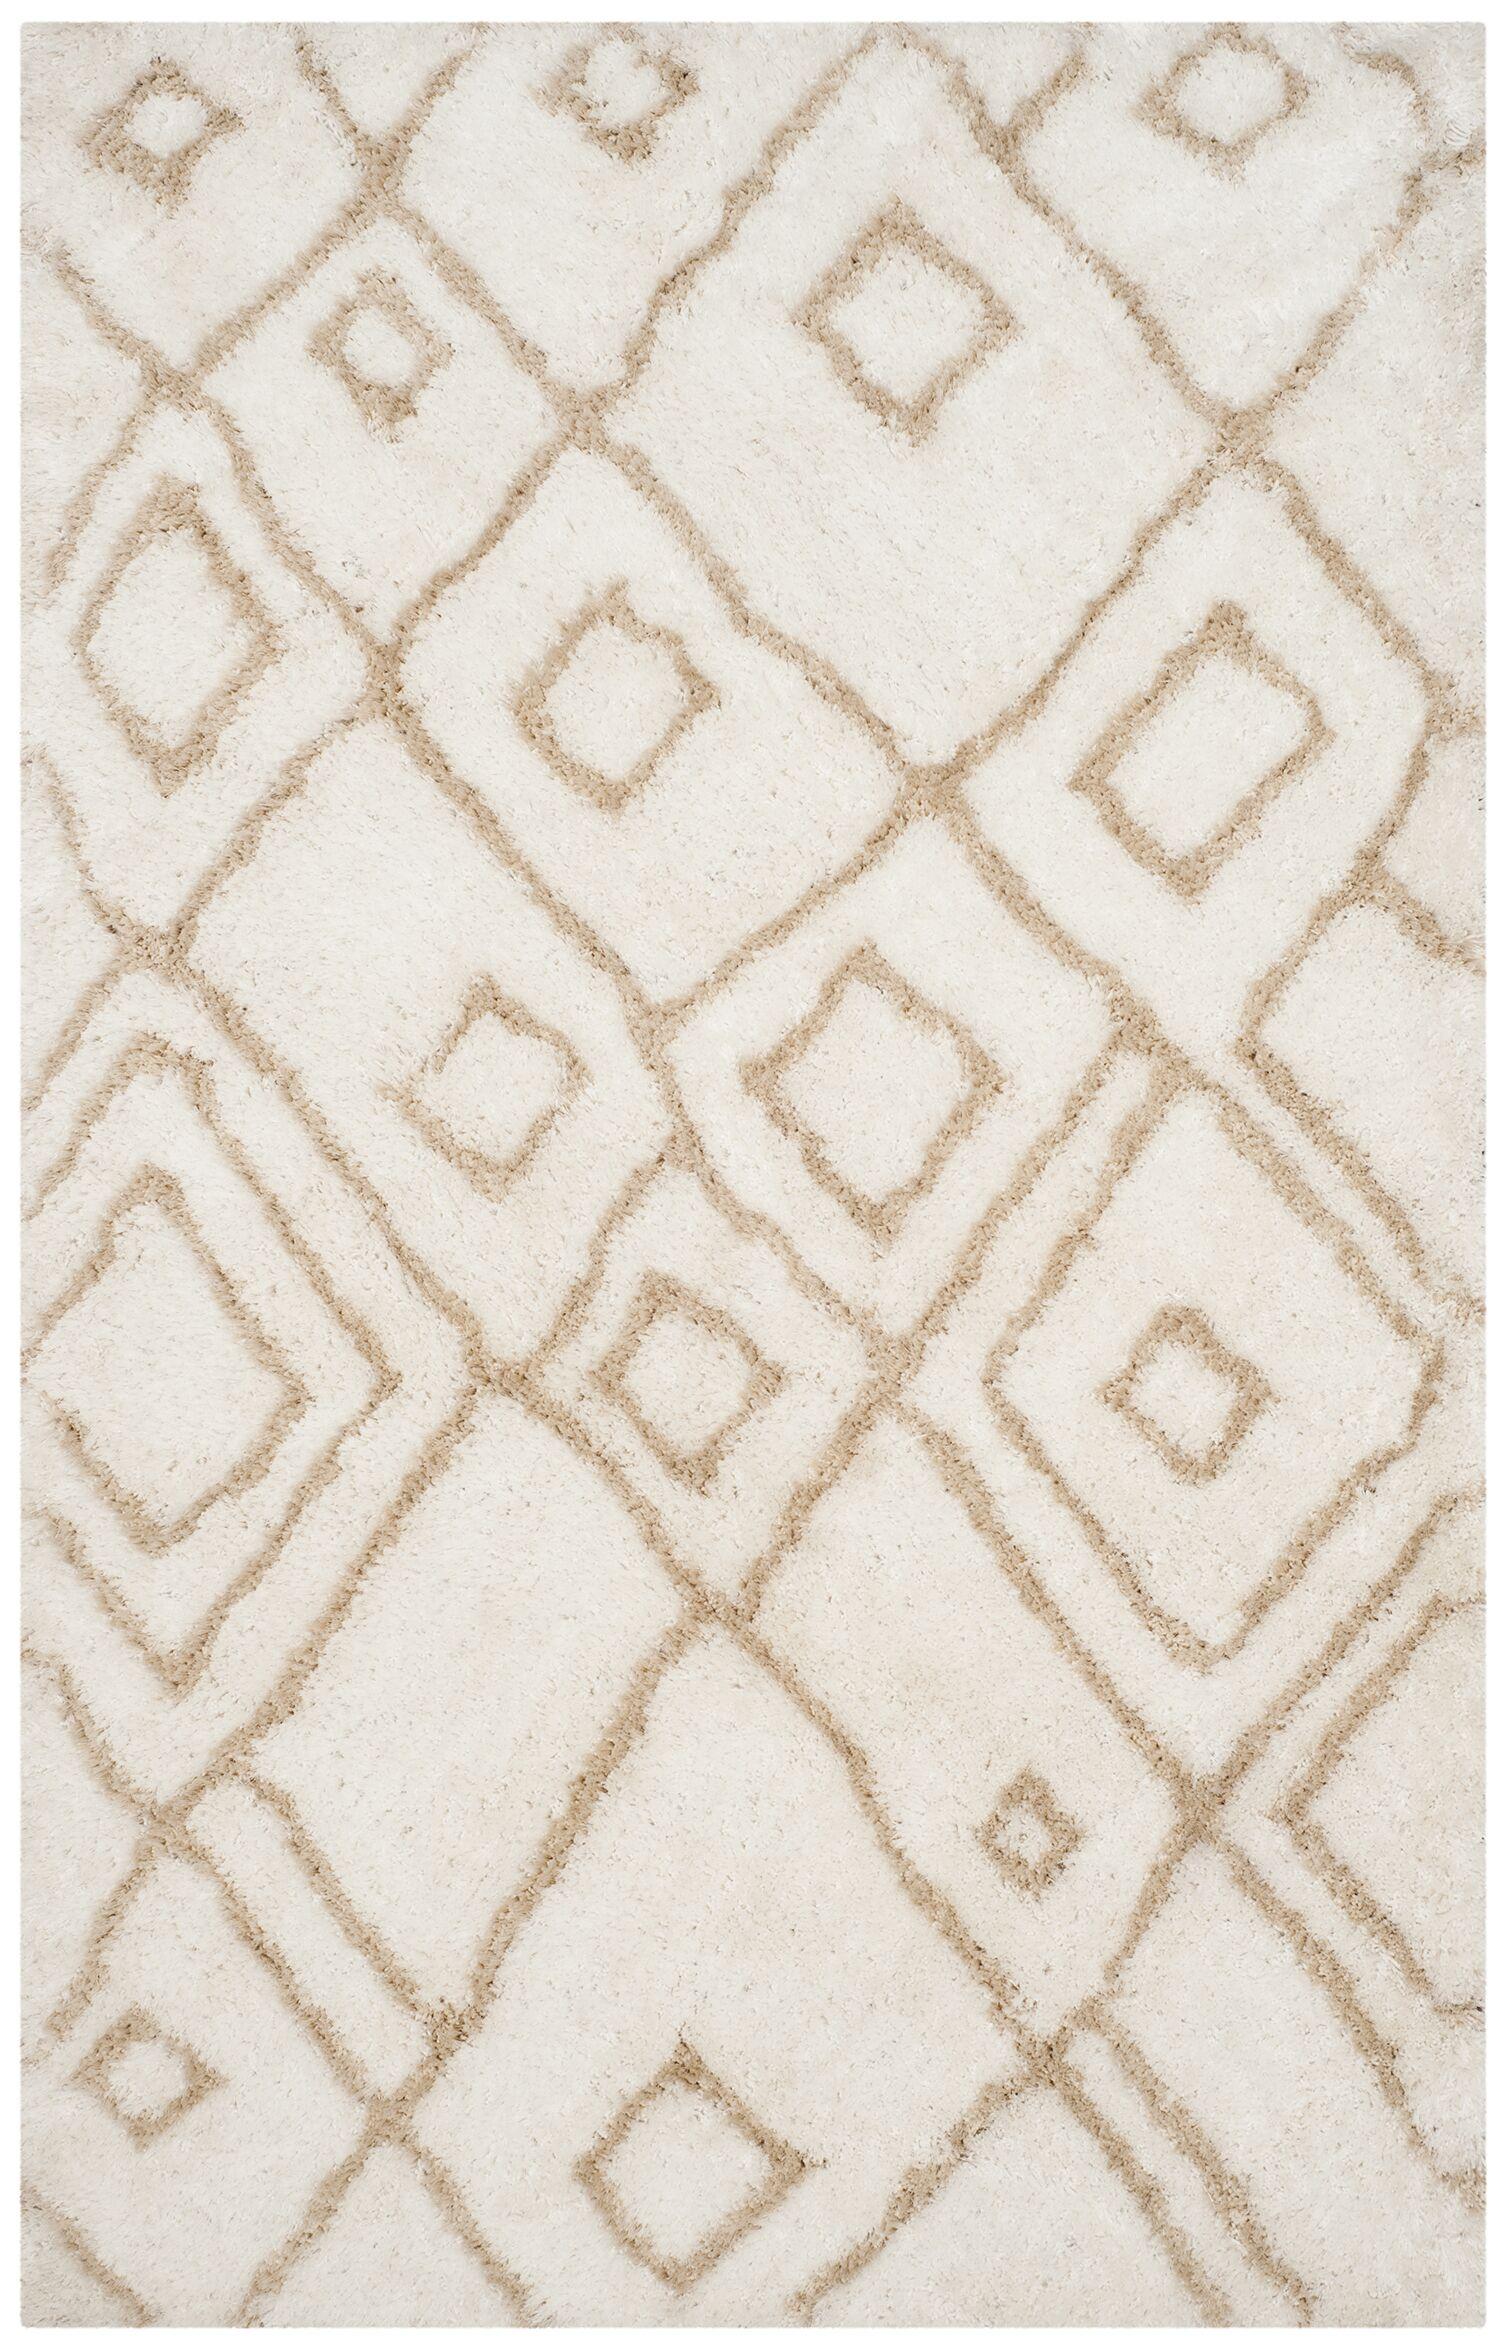 Briganti Hand-Tufted Ivory/Beige Area Rug Rug Size: Rectangle 5' x 8'